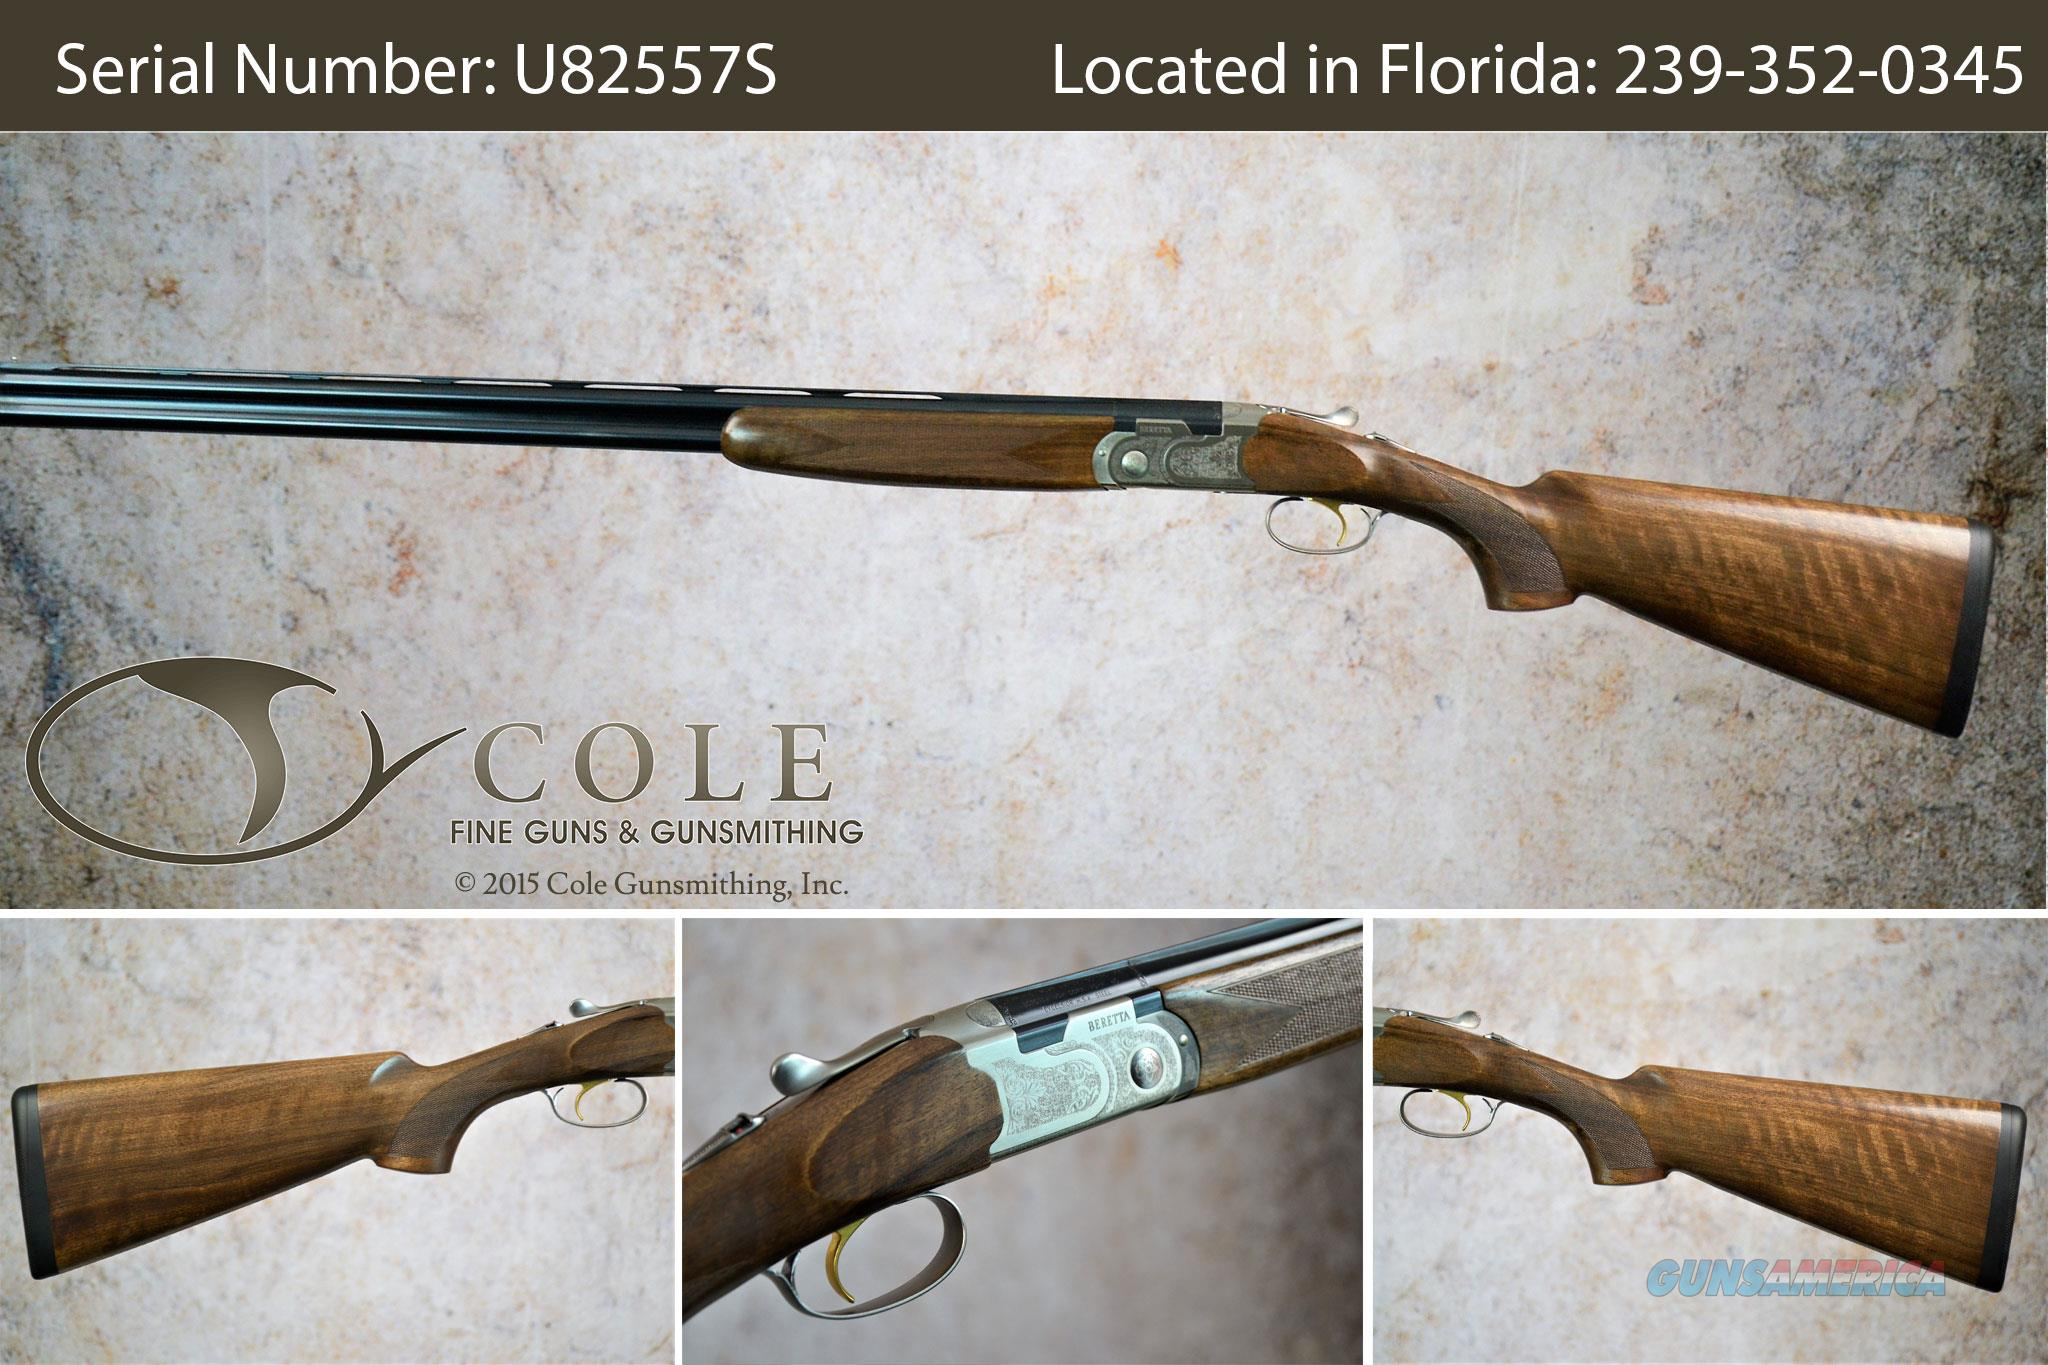 "Beretta Silver Pigeon I Field 28/410g 28"" Combo SN:#U82557S  Guns > Shotguns > Beretta Shotguns > O/U > Hunting"